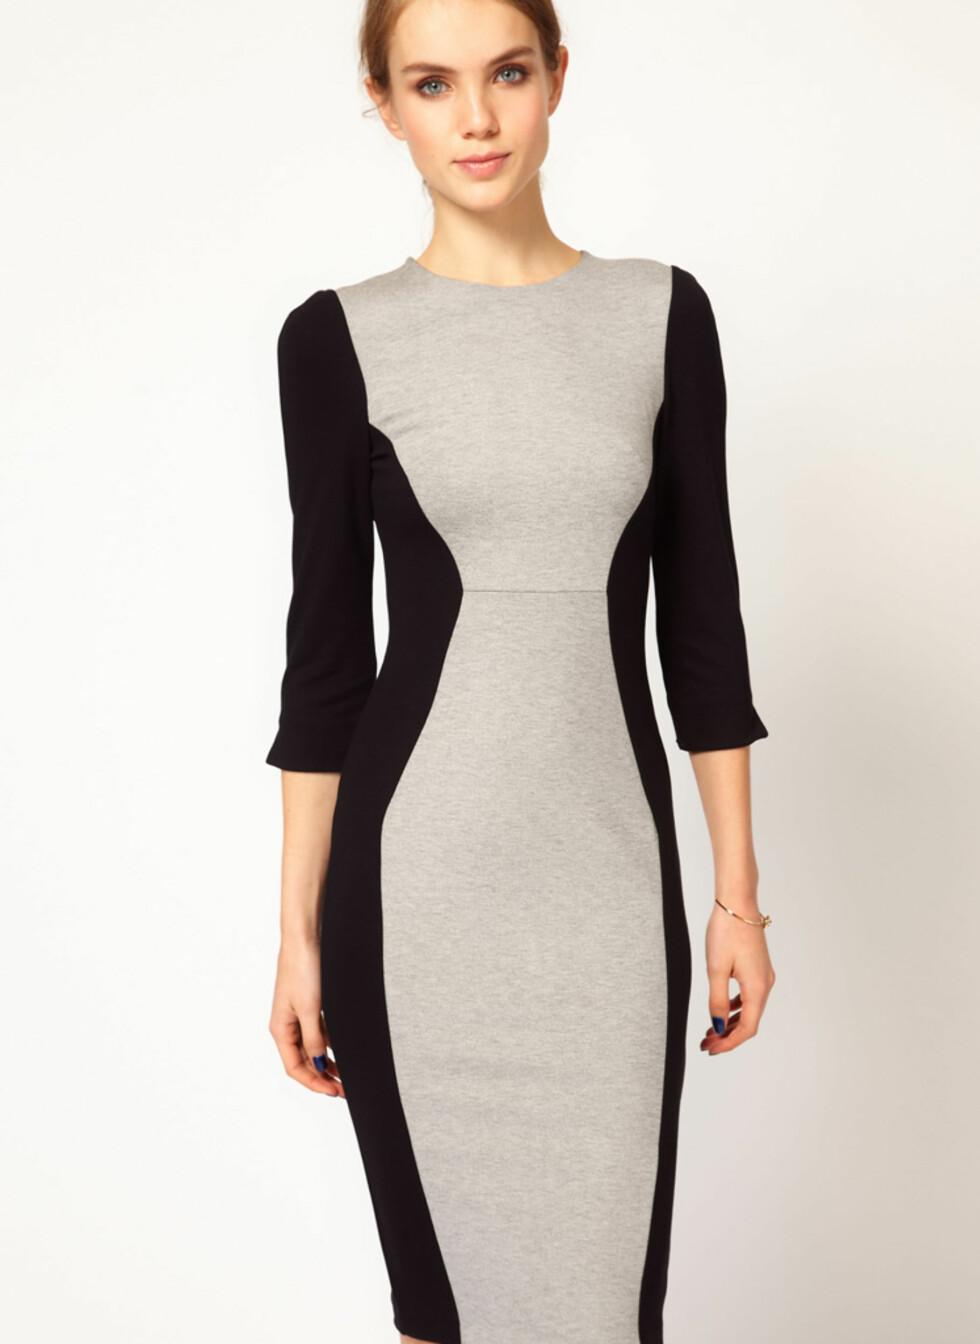 Langermet gråbeige kjole med svarte partier - cirka 330 kroner, Asos.com.  Foto: Produsenten